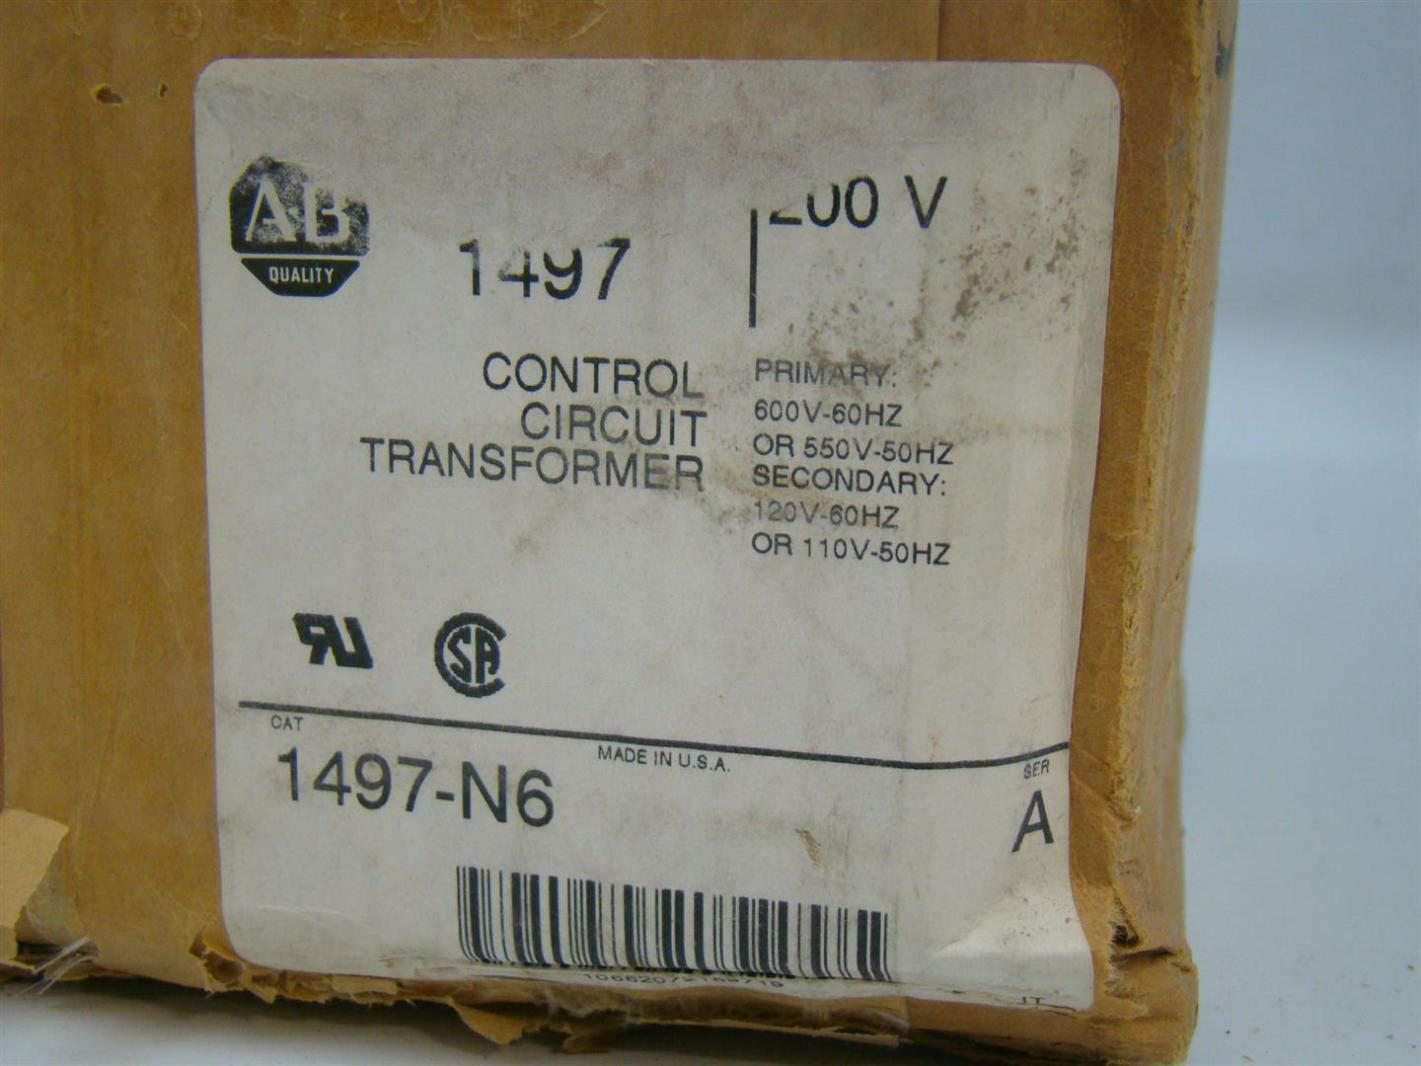 ajk218 allen bradley control circuit transformer 20kva 110 120v 1497 n6 6 micron control transformer wiring diagram efcaviation com micron control transformer wiring diagram at webbmarketing.co